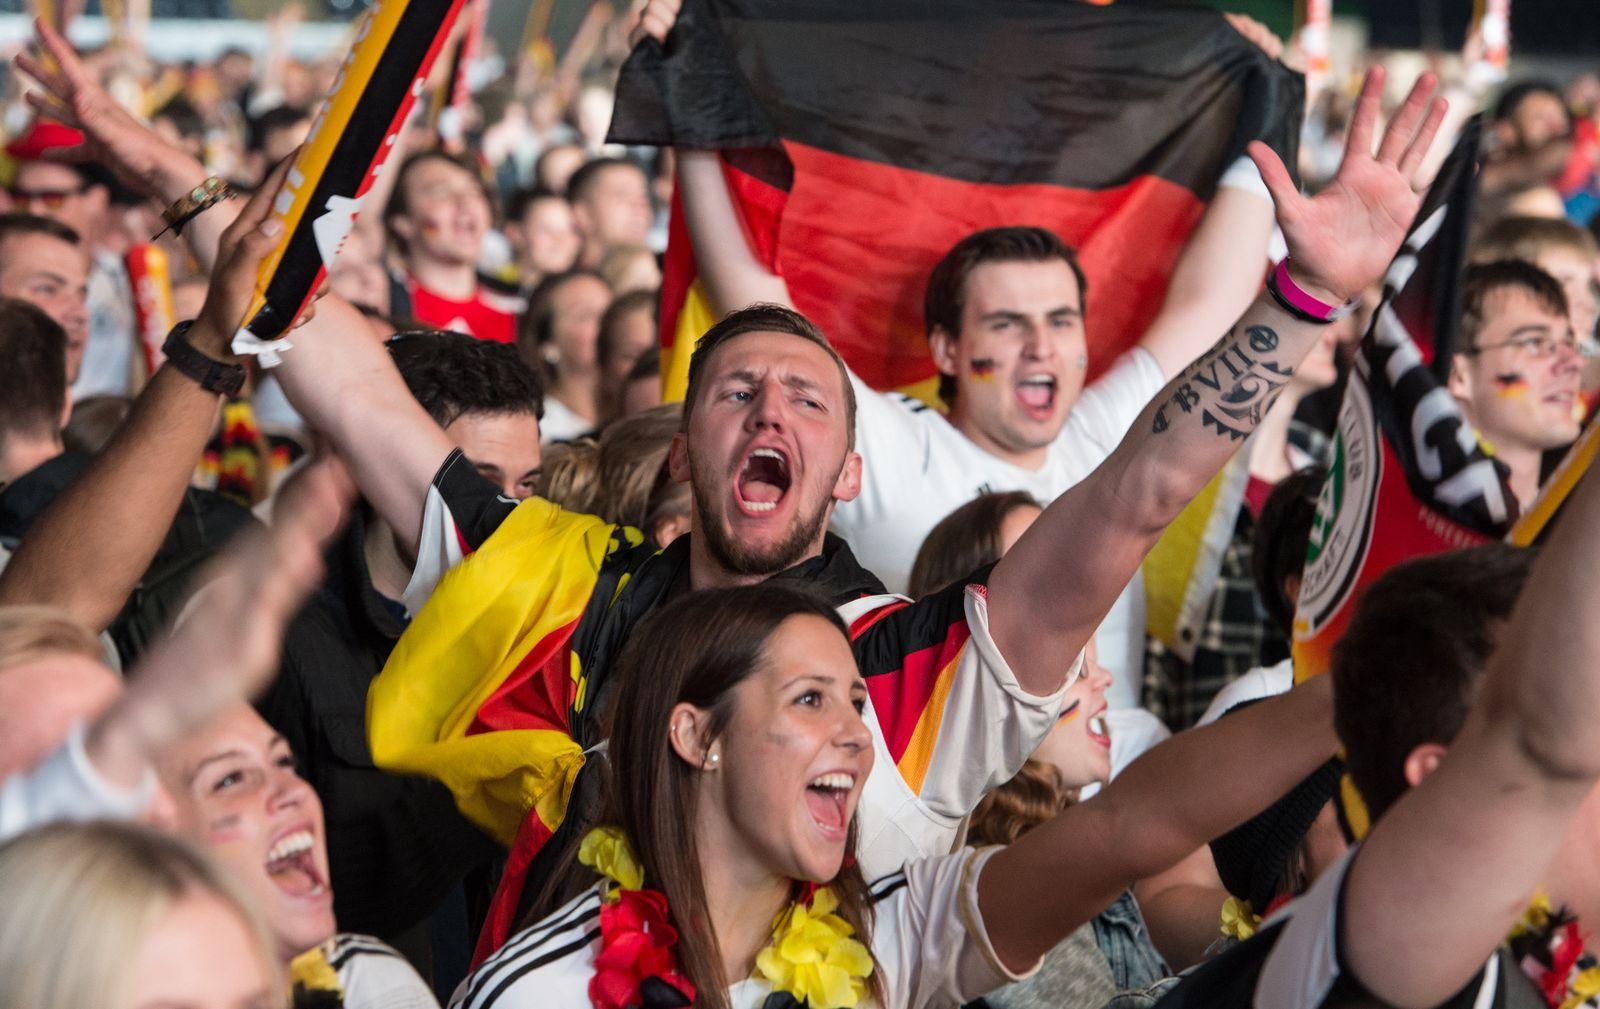 EURO 2016 - Public Viewing in Frankfurt am Main